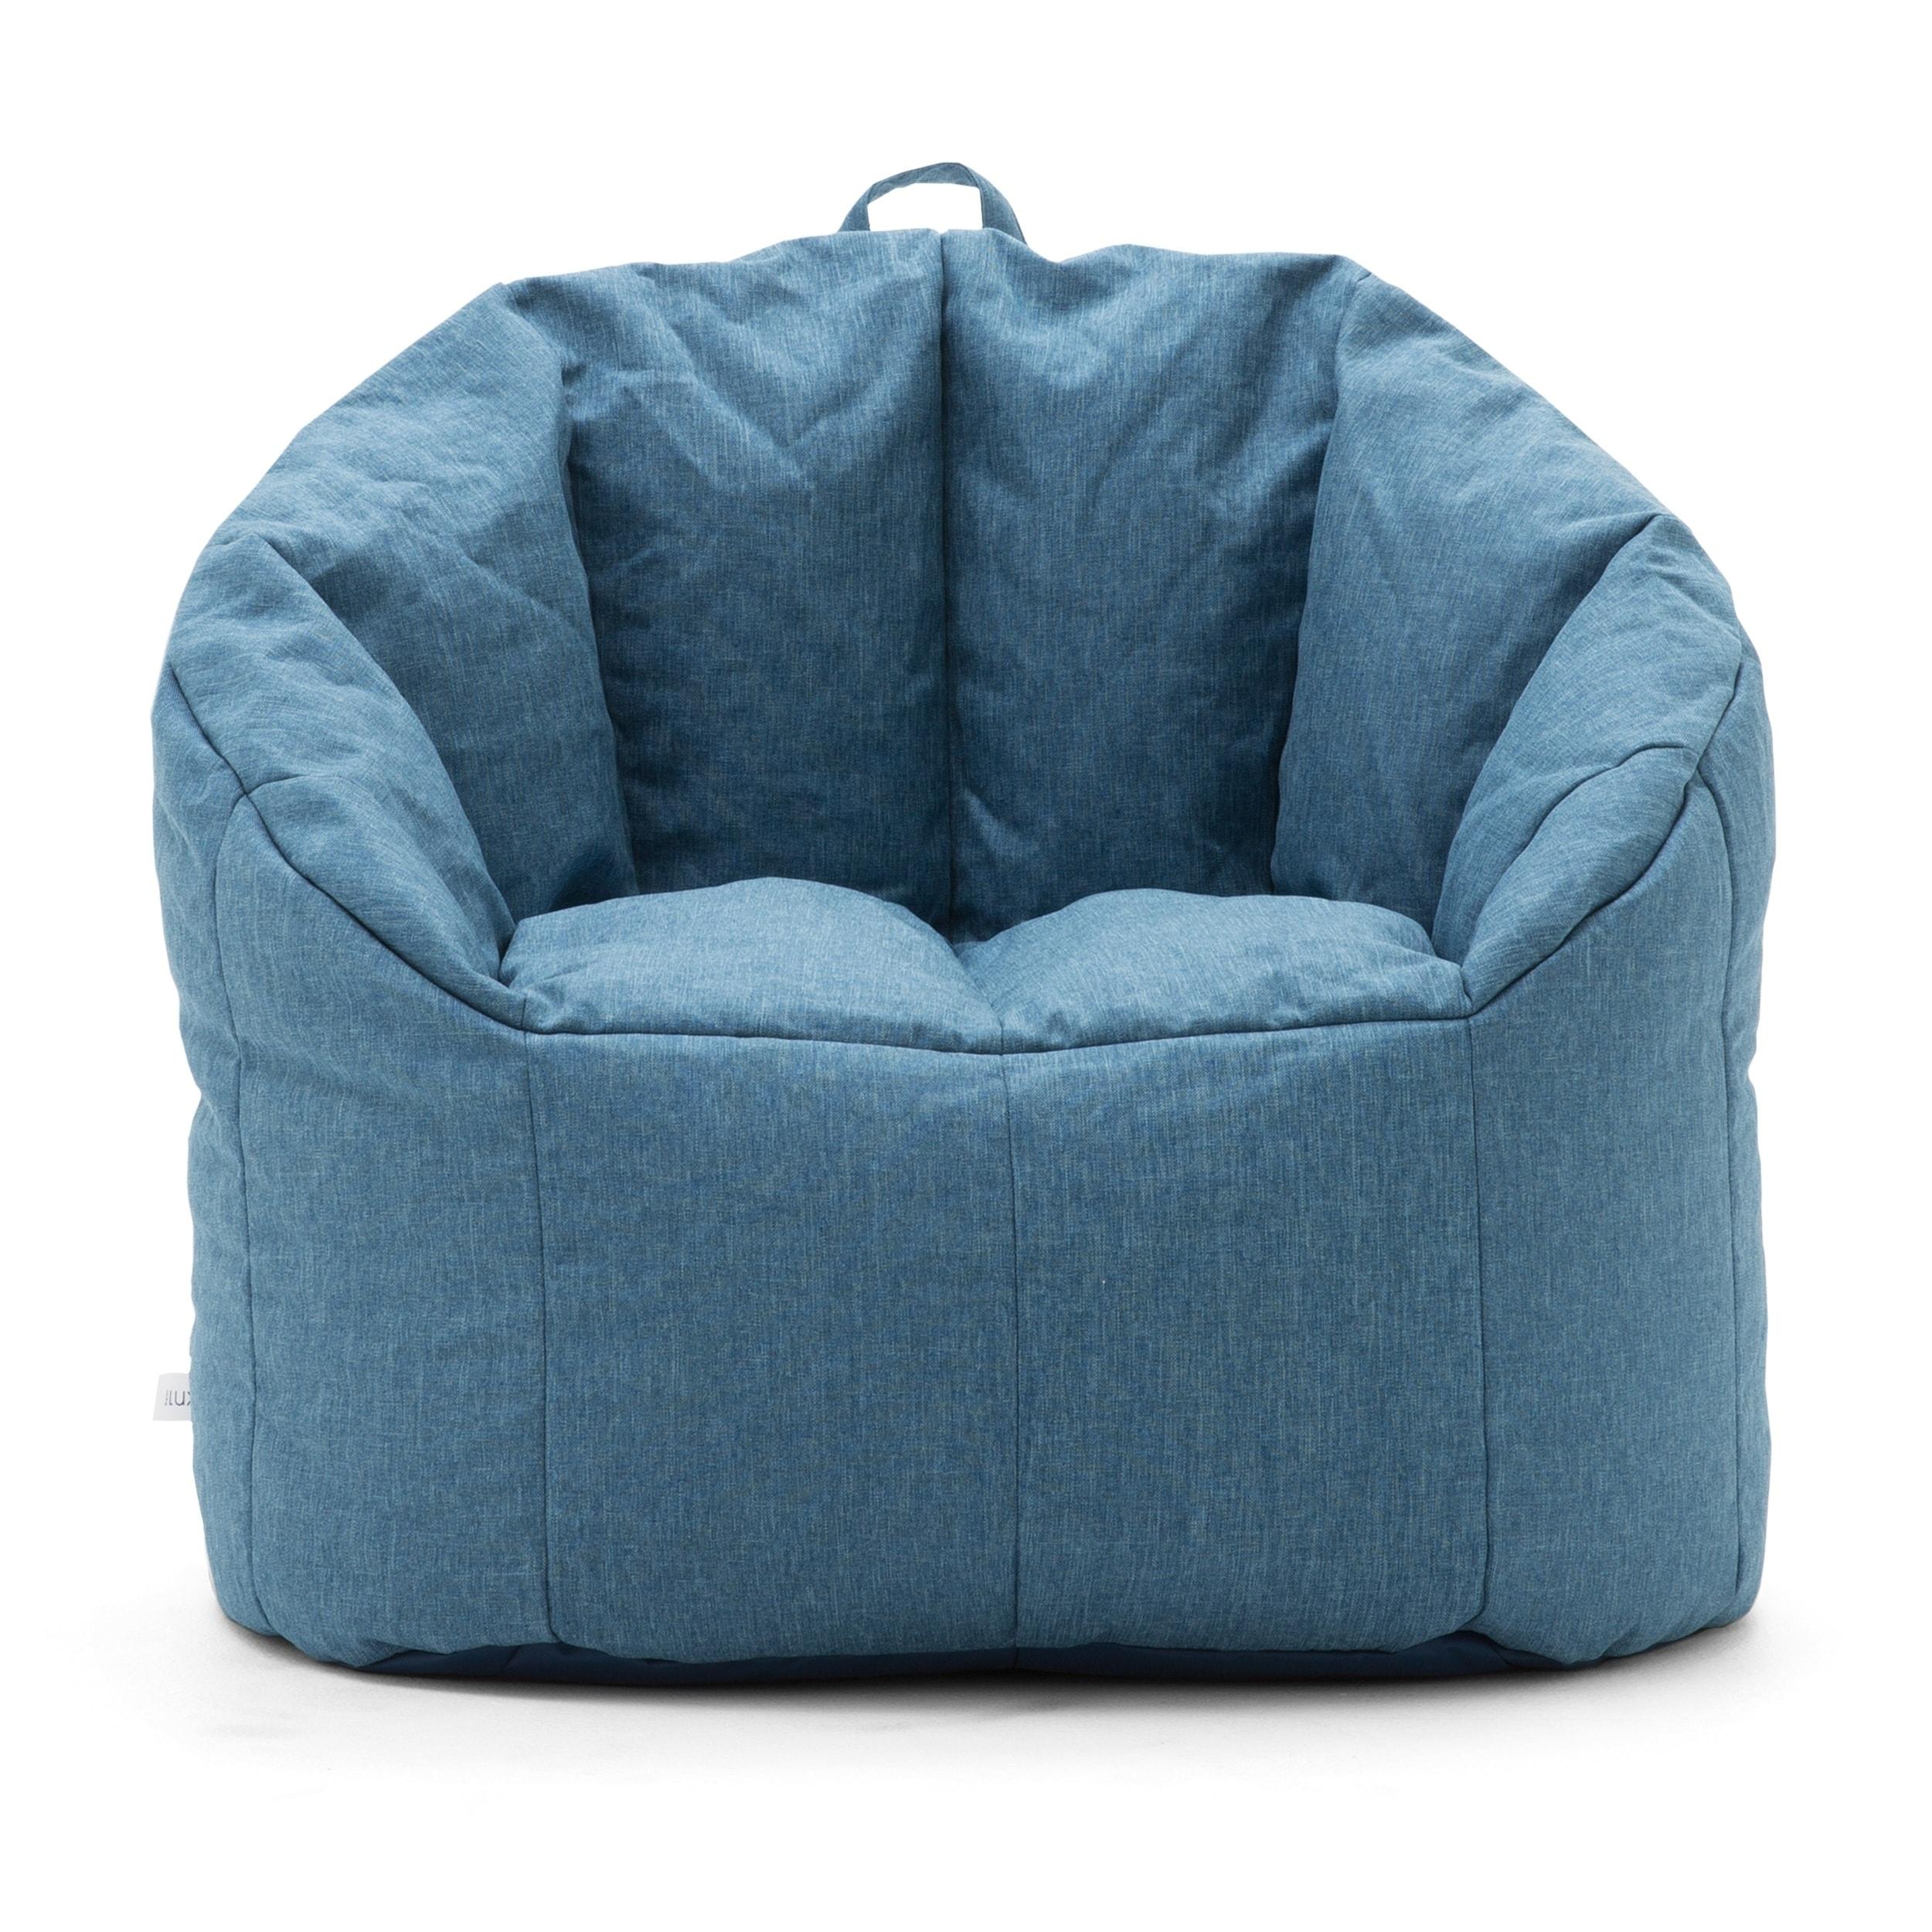 Admirable Big Joe Lux Union Milano Bean Bag Chair Multiple Colors Evergreenethics Interior Chair Design Evergreenethicsorg